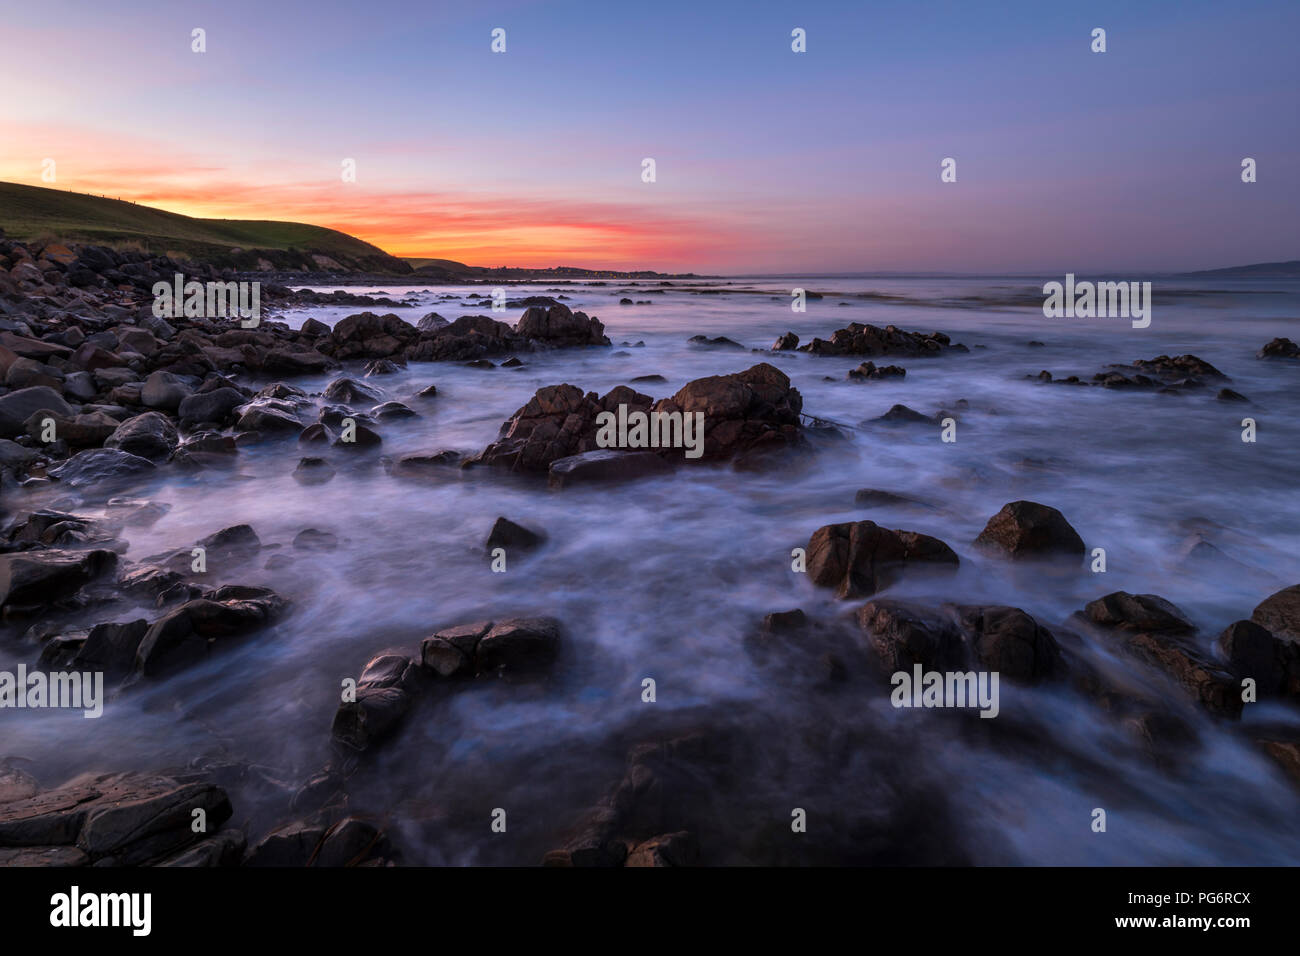 Neuseeland, Südinsel, Southern Scenic Route, Catlins, Sonnenuntergang in Kaka Point Stockfoto